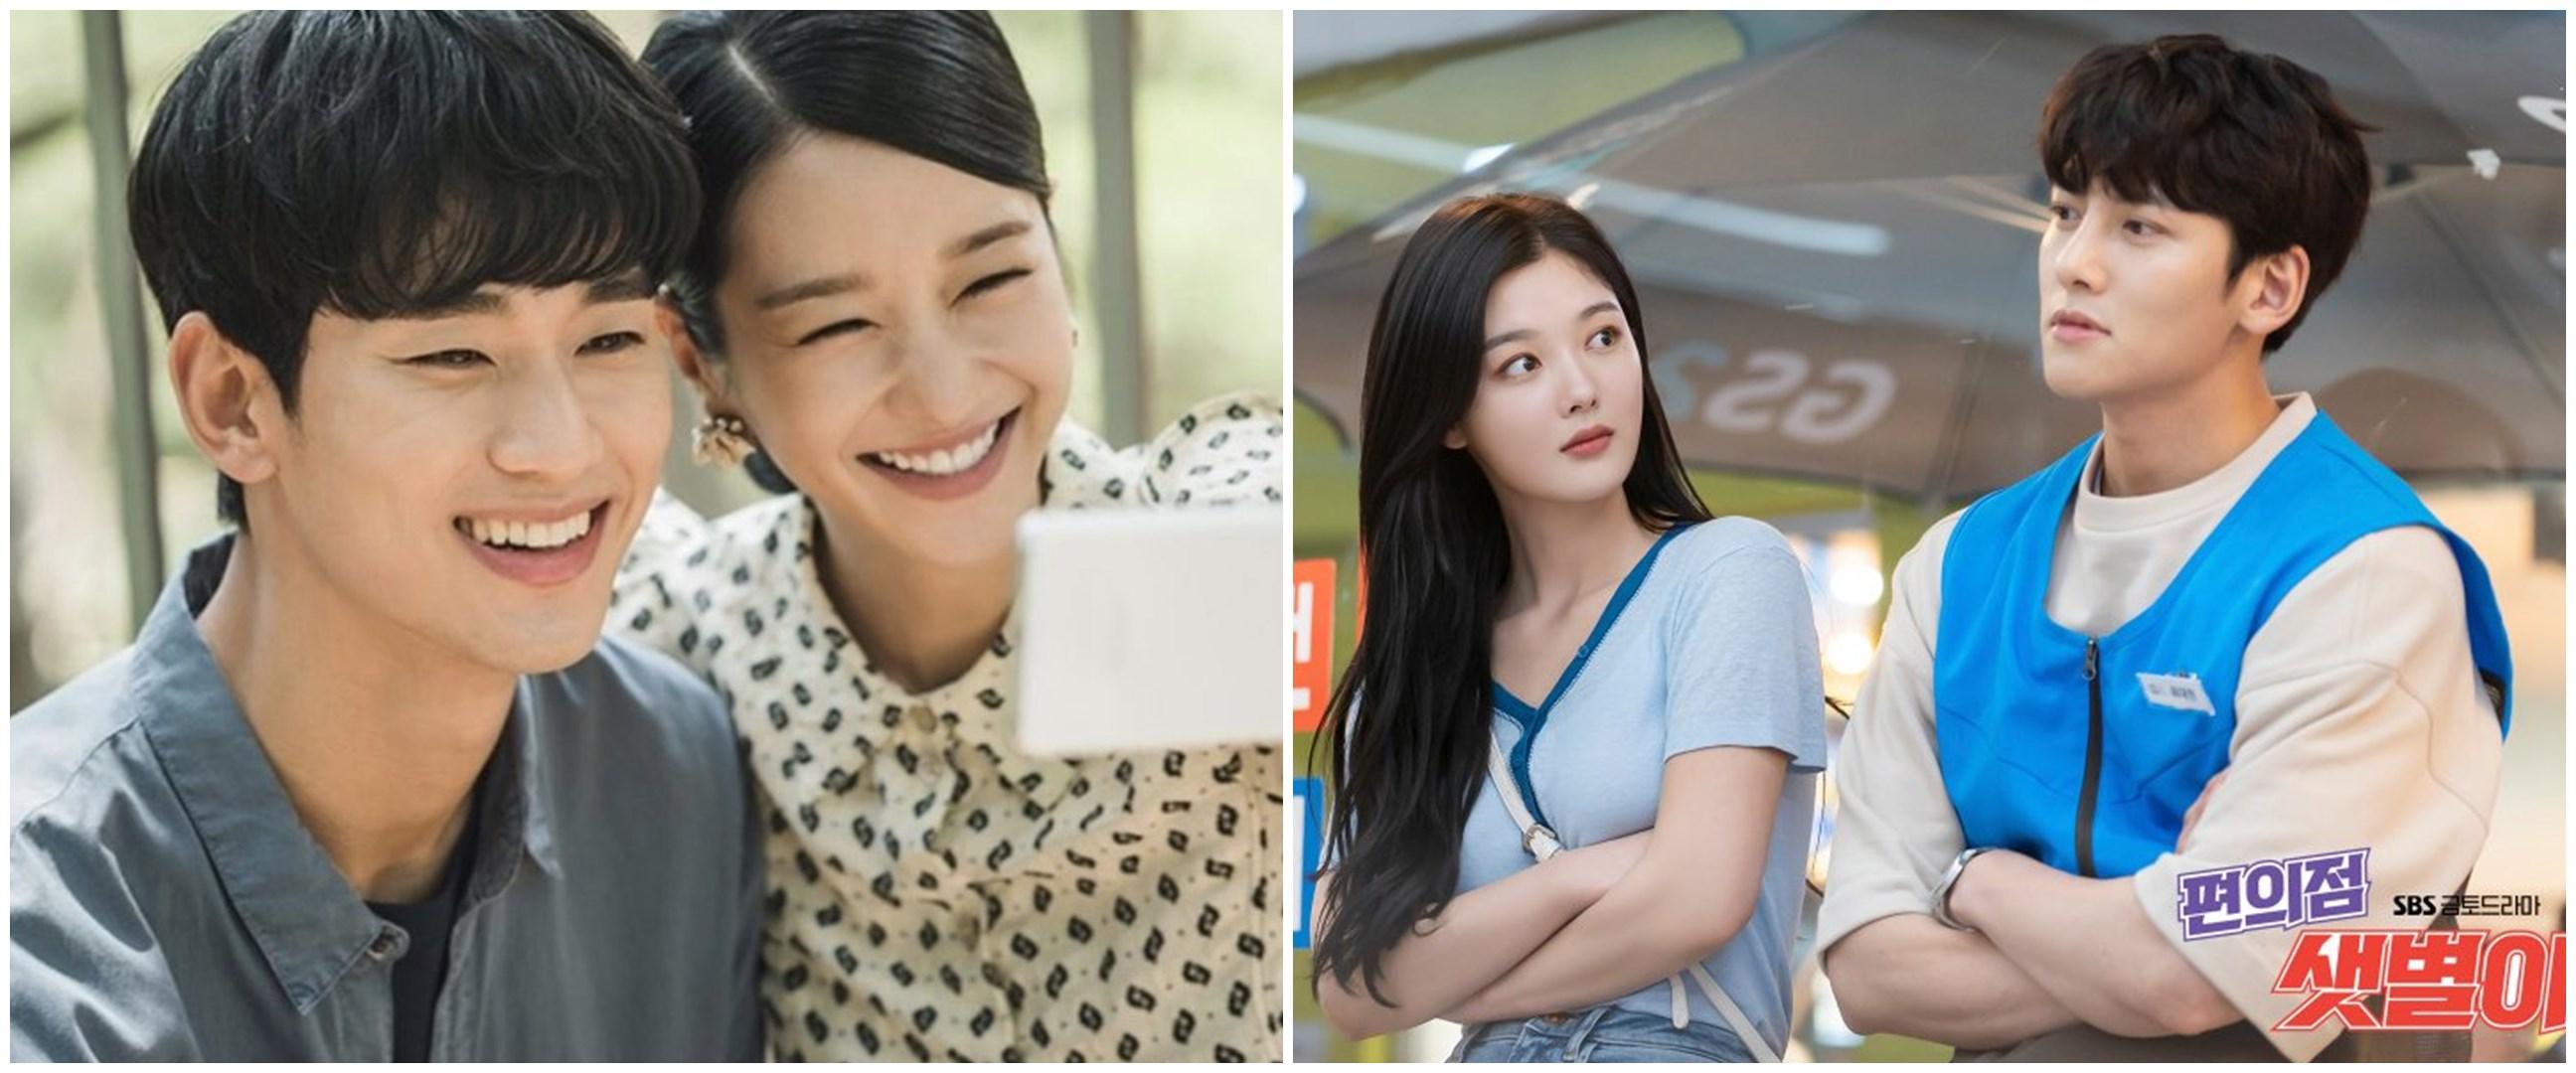 7 Drama Korea rating tertinggi Juli 2020, bertabur bintang